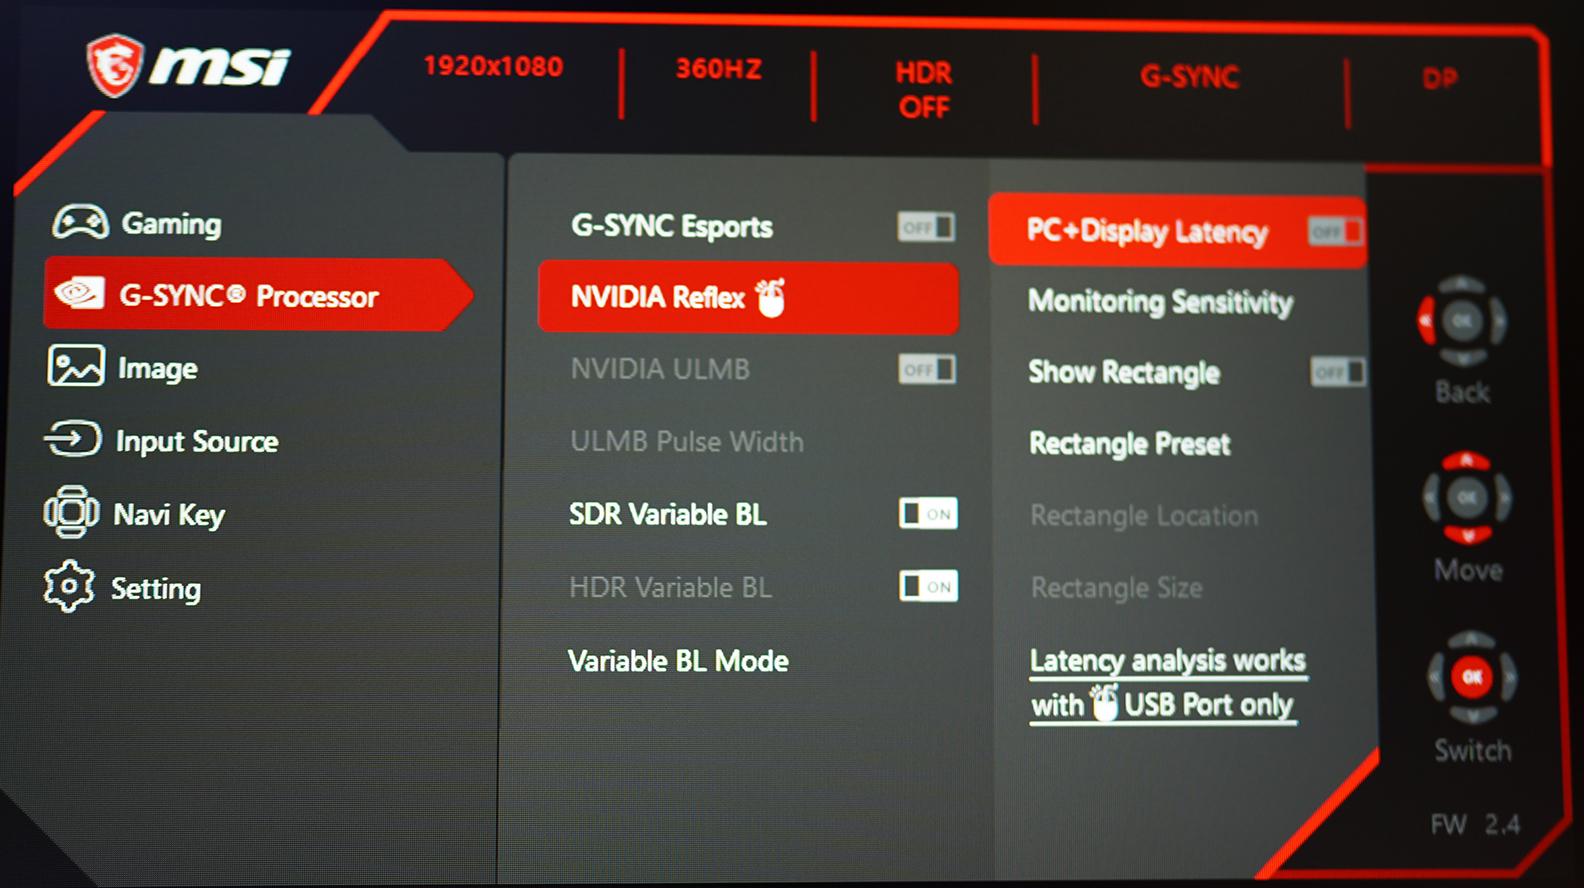 MSI Oculux NXG253R - OSD 2